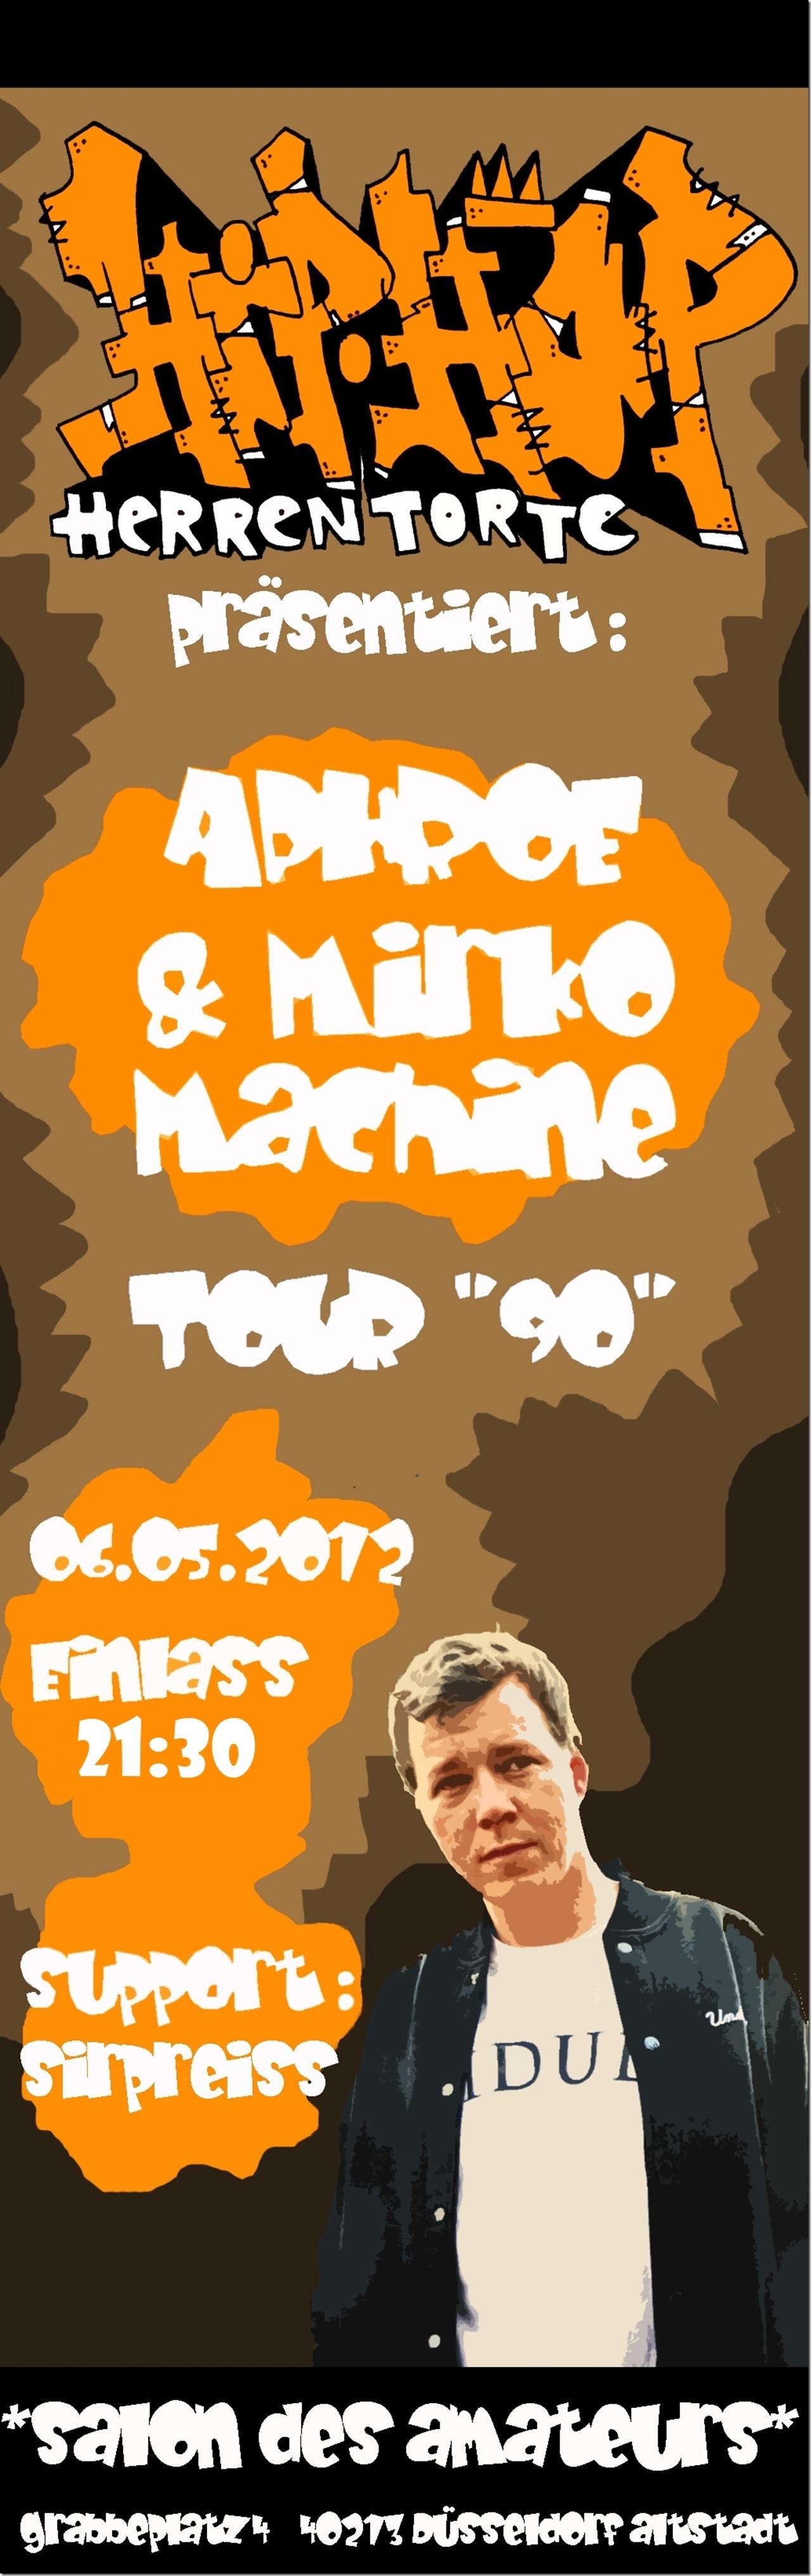 Aphroe, Mirko Maschine & SirPreiss Flyer